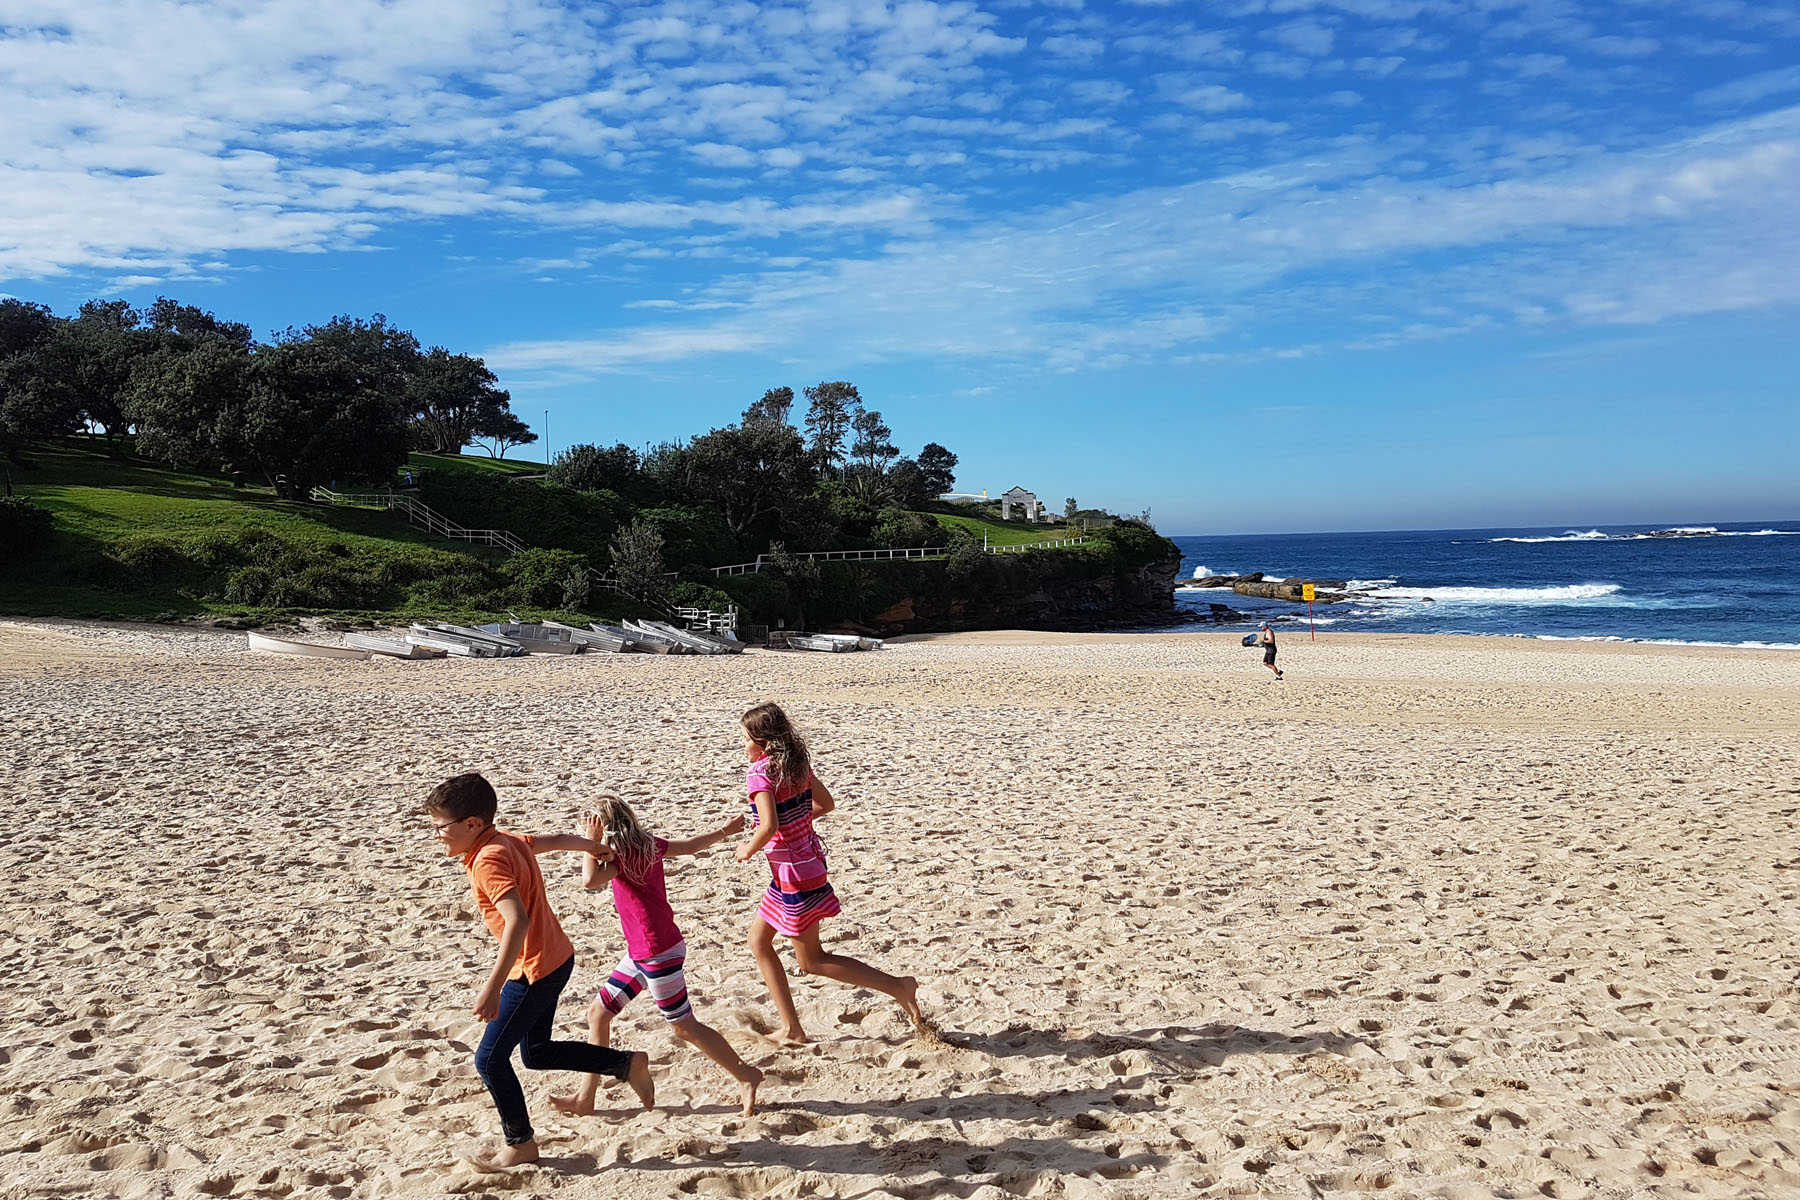 SGMT Australia Sydney_Bondi to Coogee Coastal Walk_05 Coogee Beach Children Playing